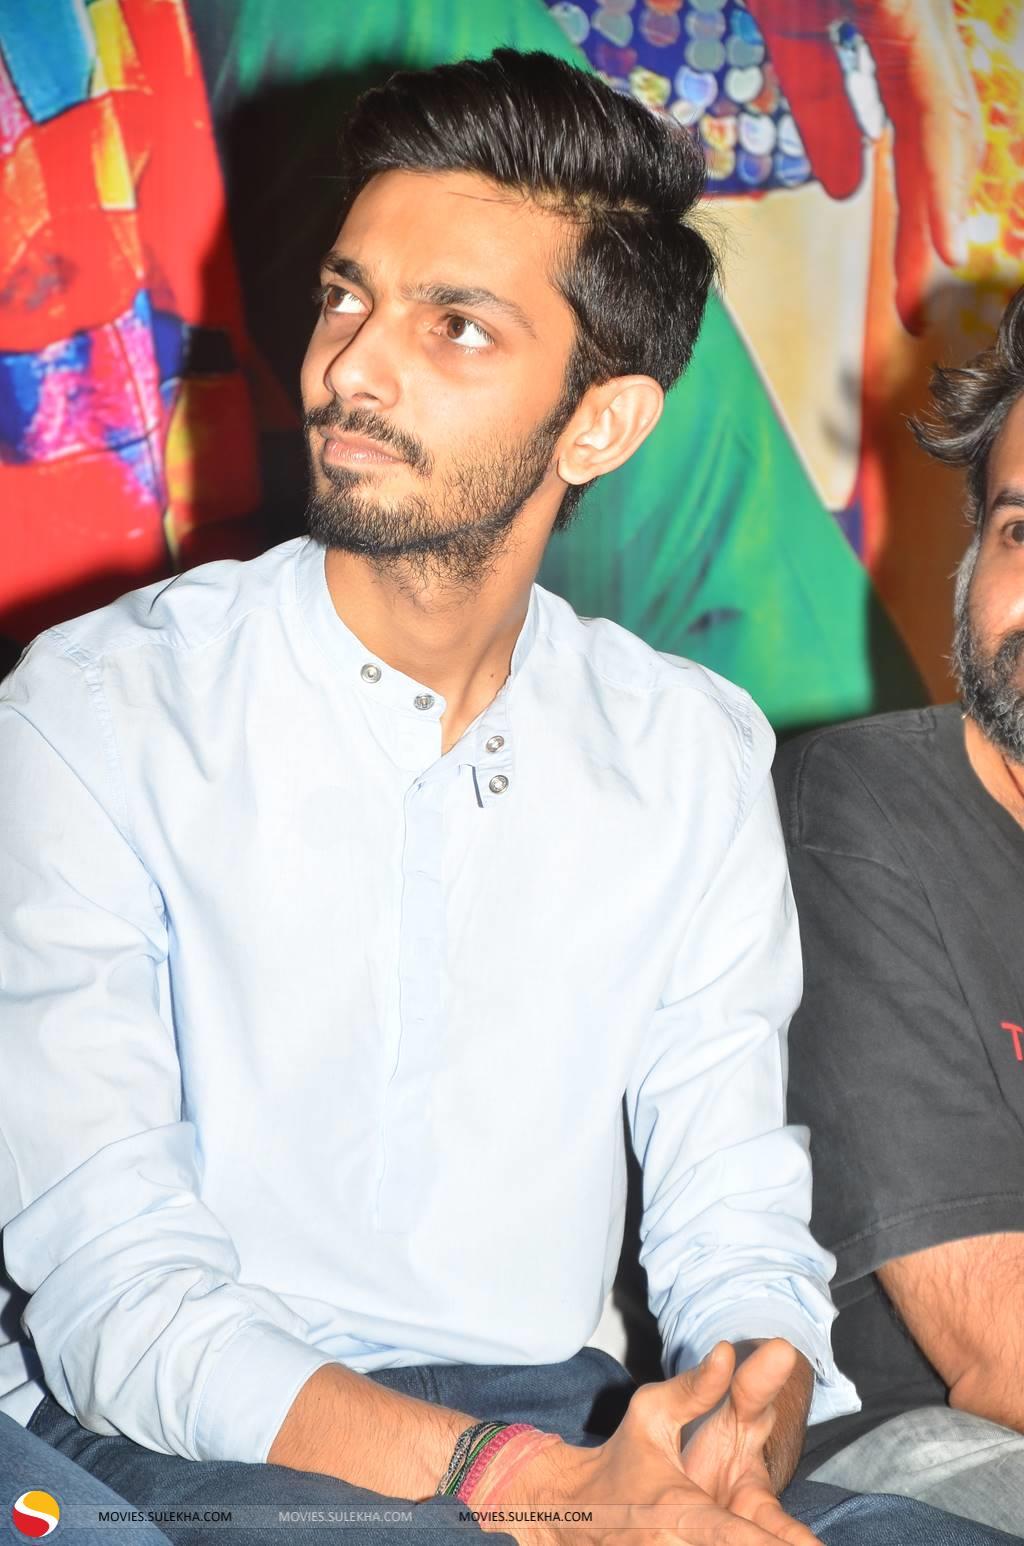 Page 3 Of Anirudh Ravichander At Rk Nagar Movie Trailer Launch